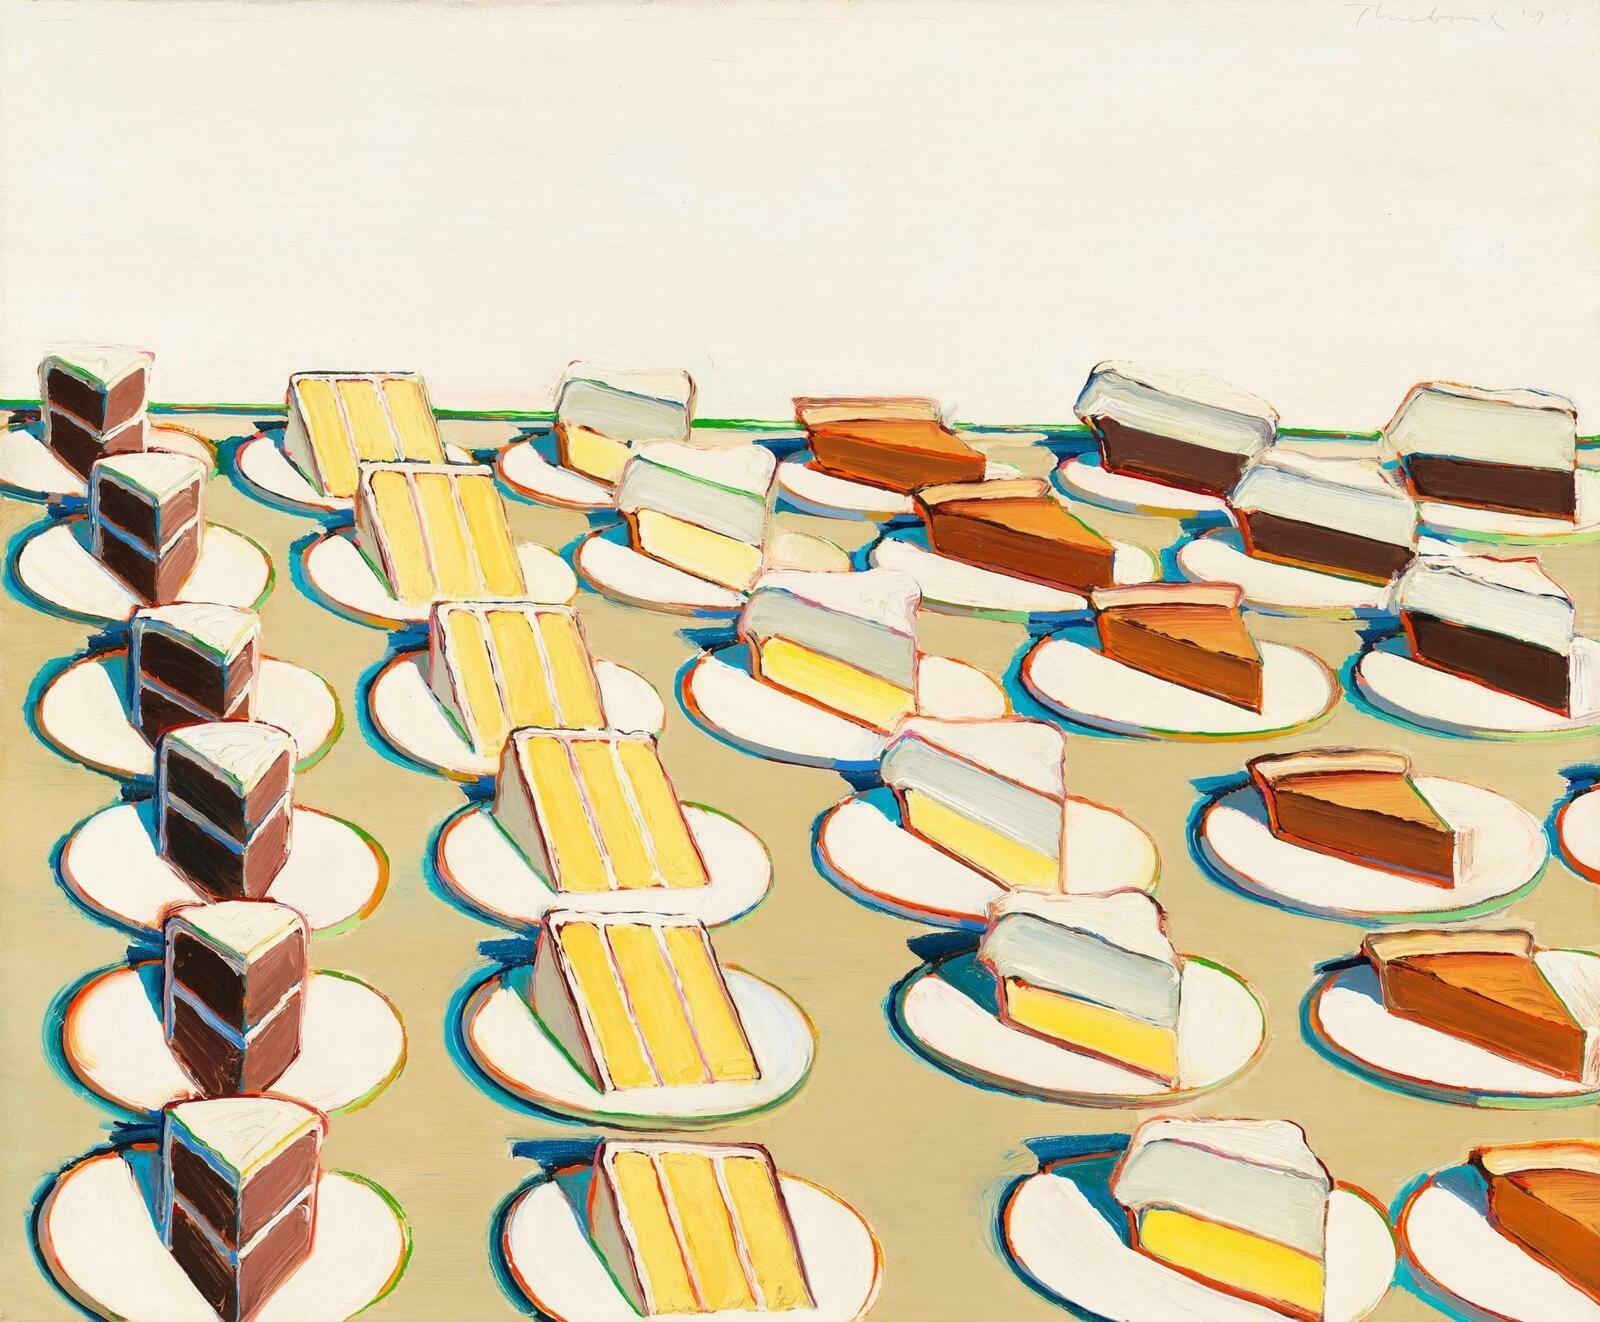 Wayne Thiebaud | Pie Counter | Whitney Museum of American Art